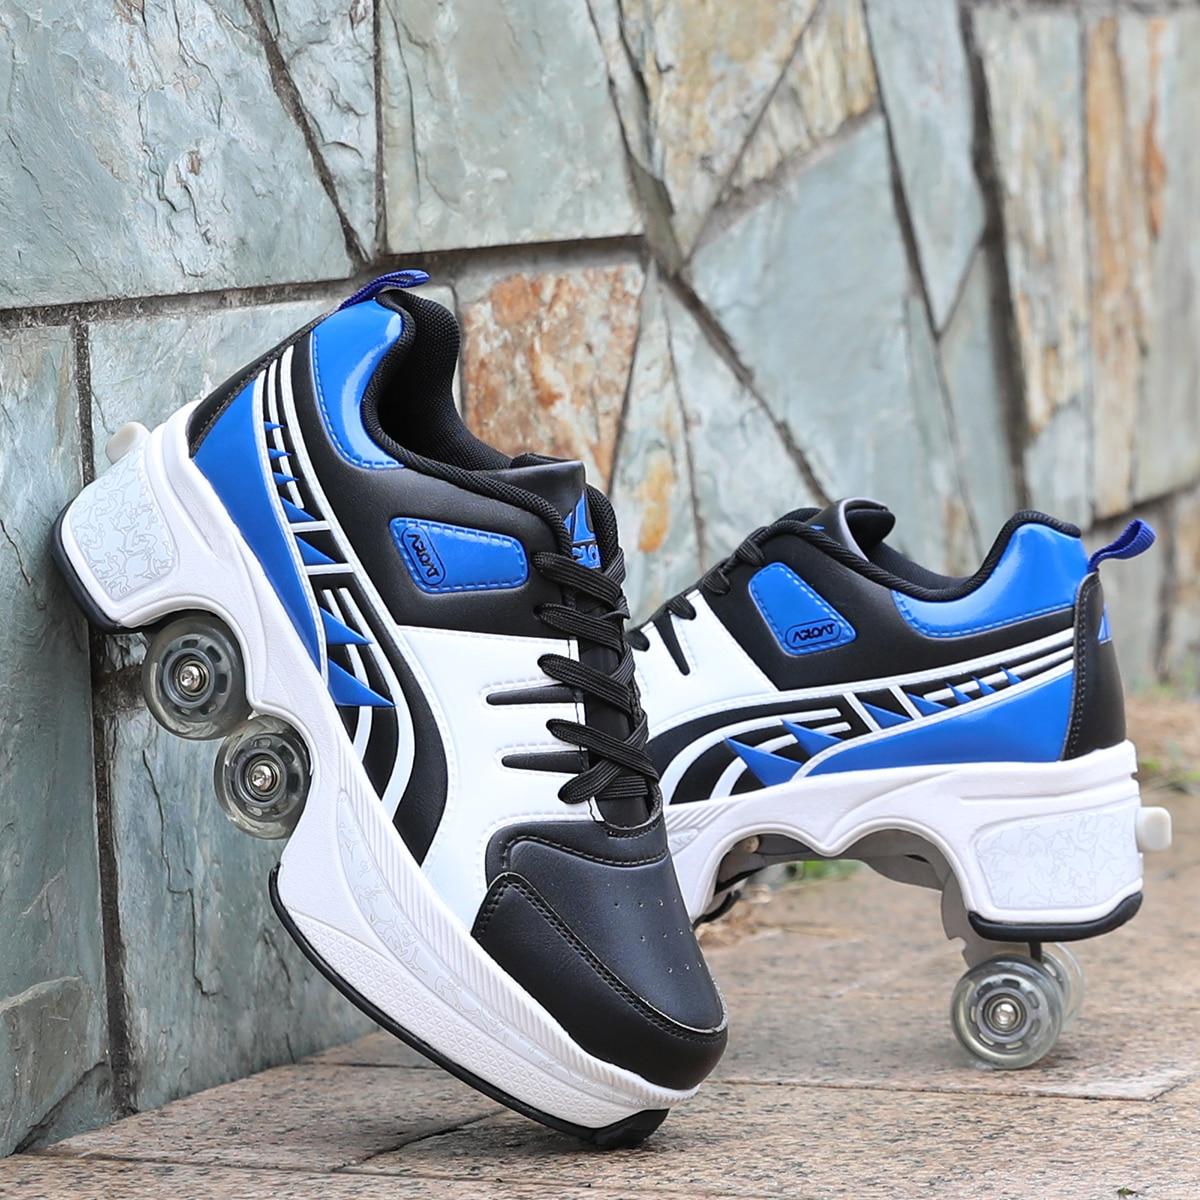 Hot Walk Roller s Deform Wheel Skates for Adult Men Women Unisex Child Runaway Shoes Casual Sneakers Skate Skates Four Wheeled